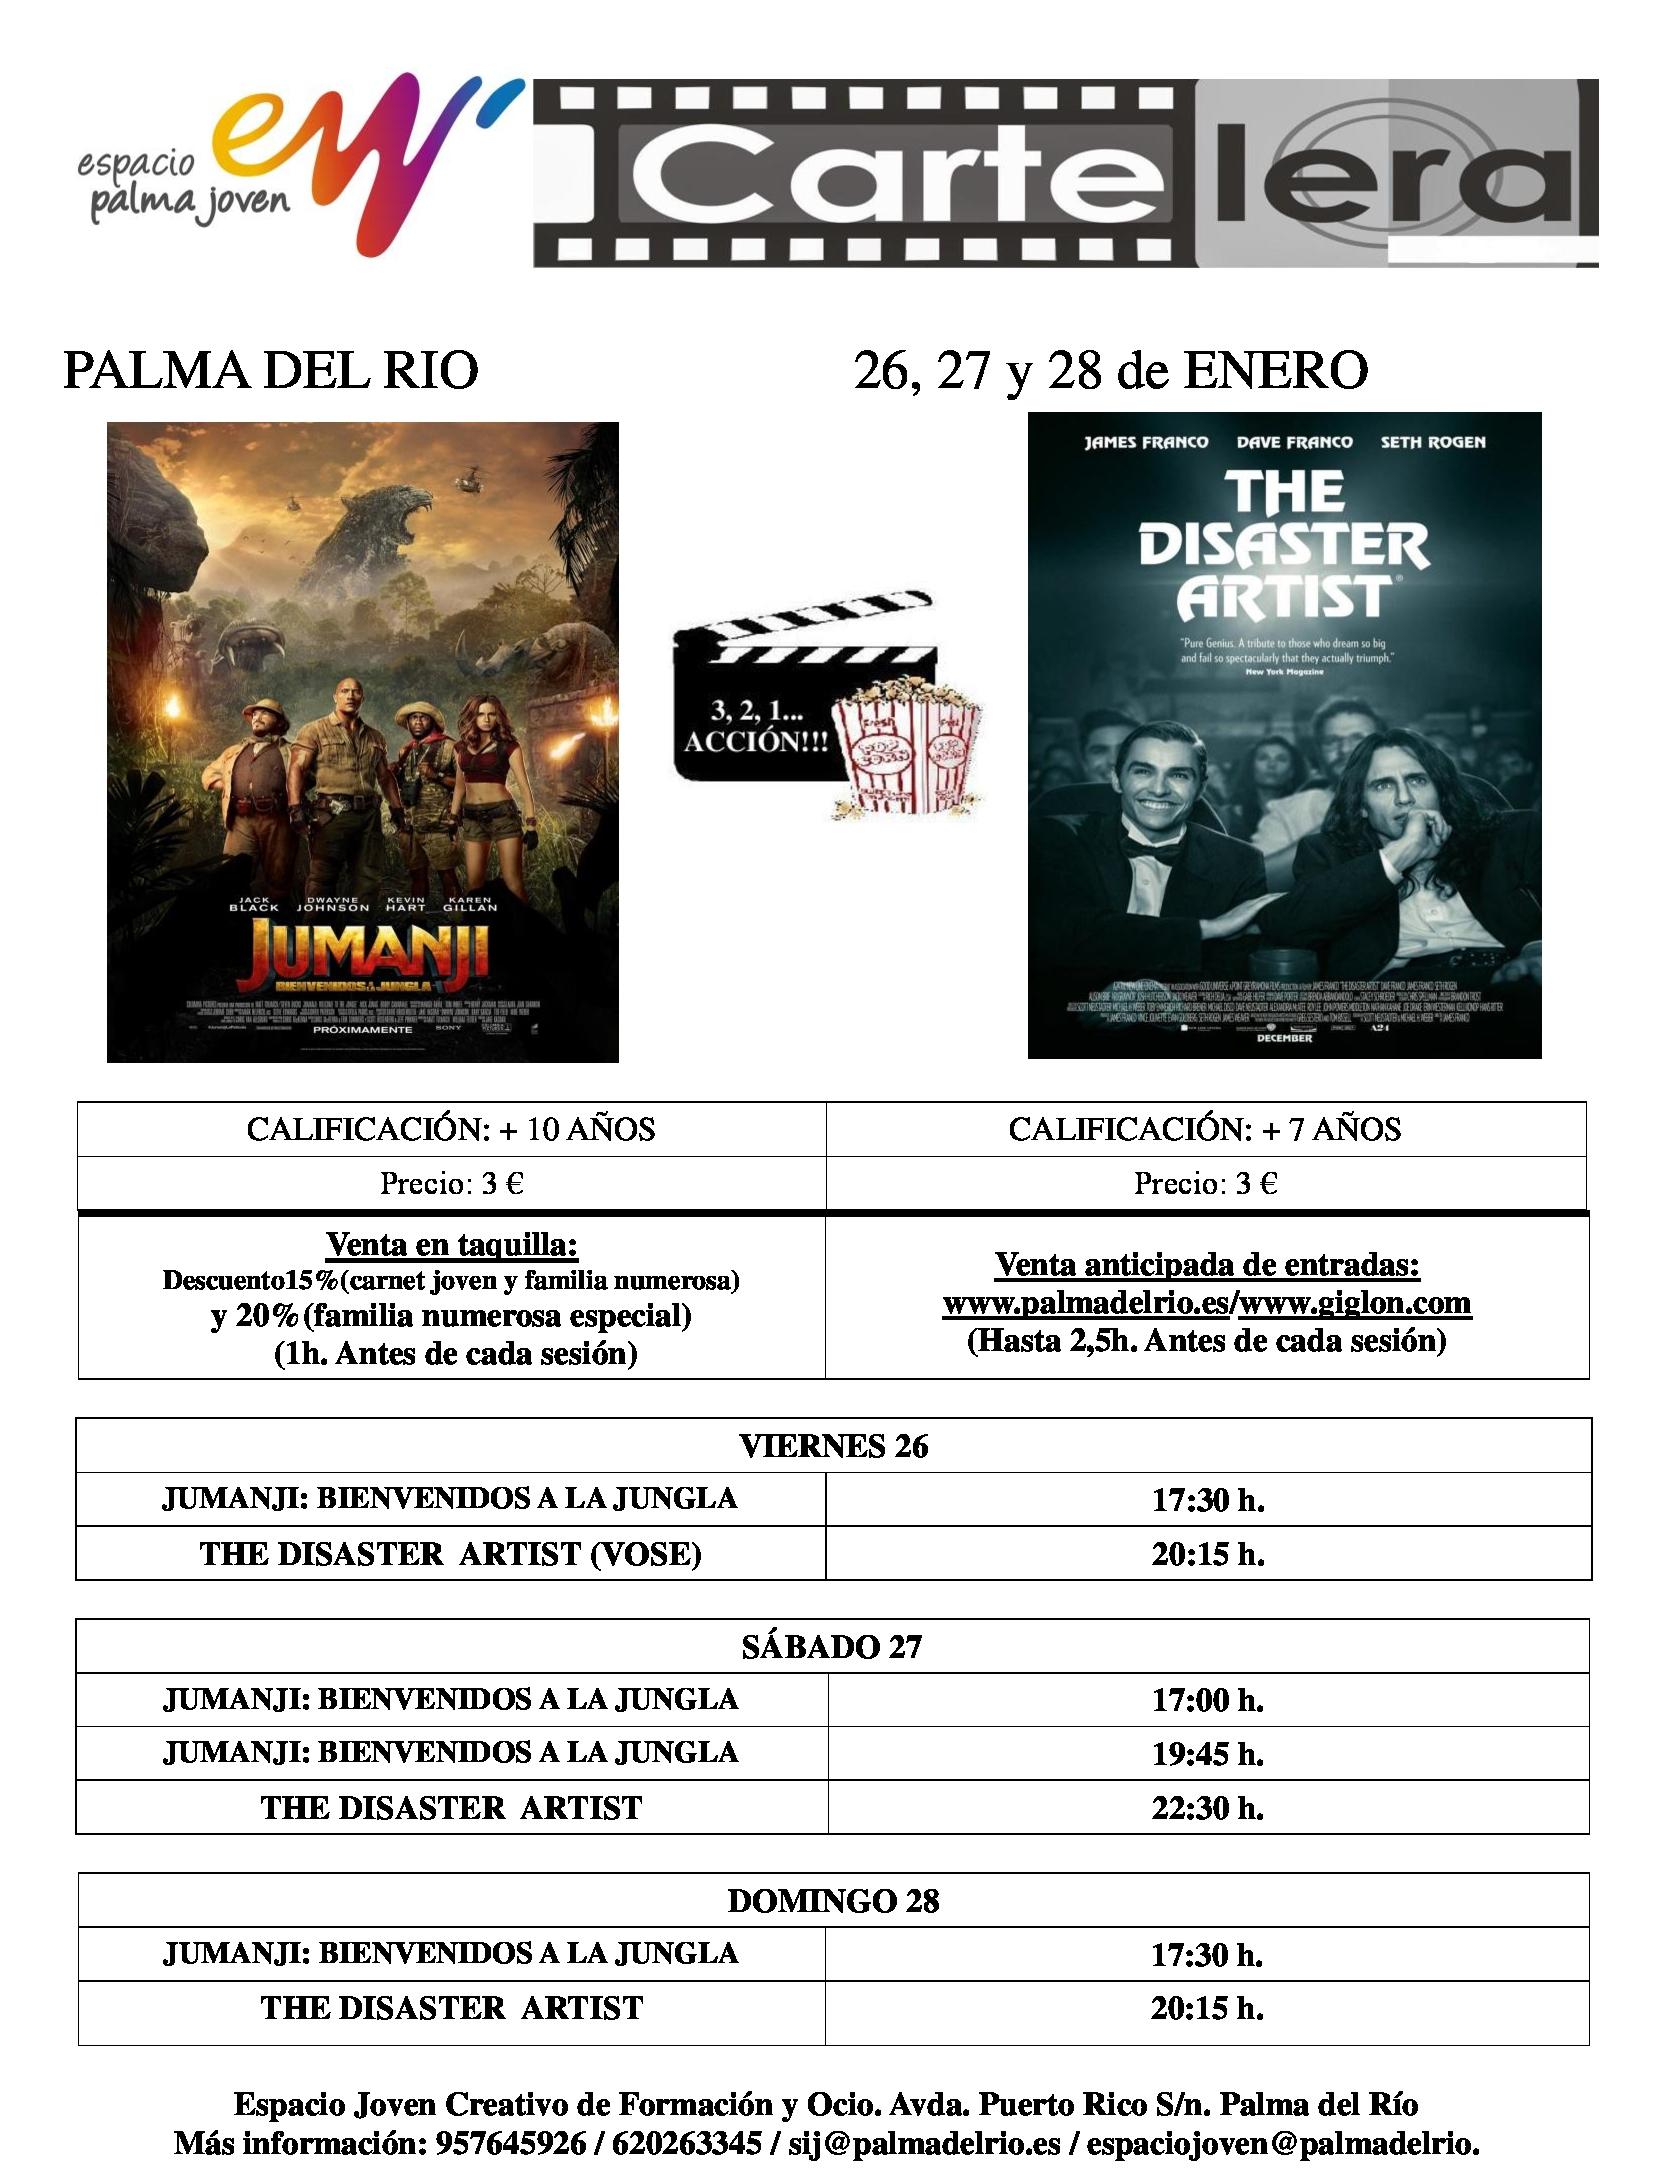 https://www.palmadelrio.es/sites/default/files/cartelera_26_27_y_28_enero_2018.jpg